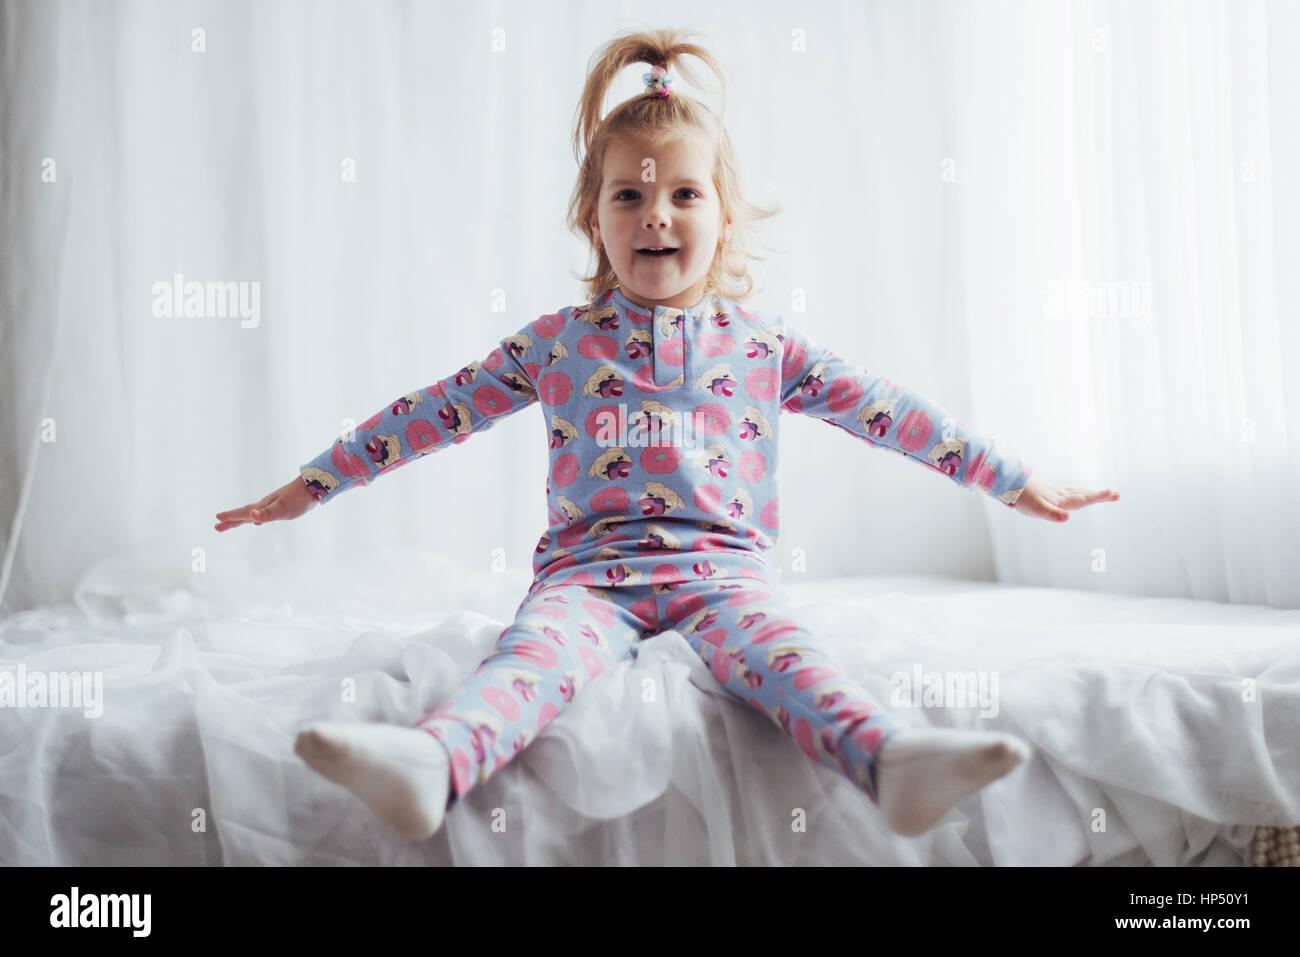 Child in pajama - Stock Image